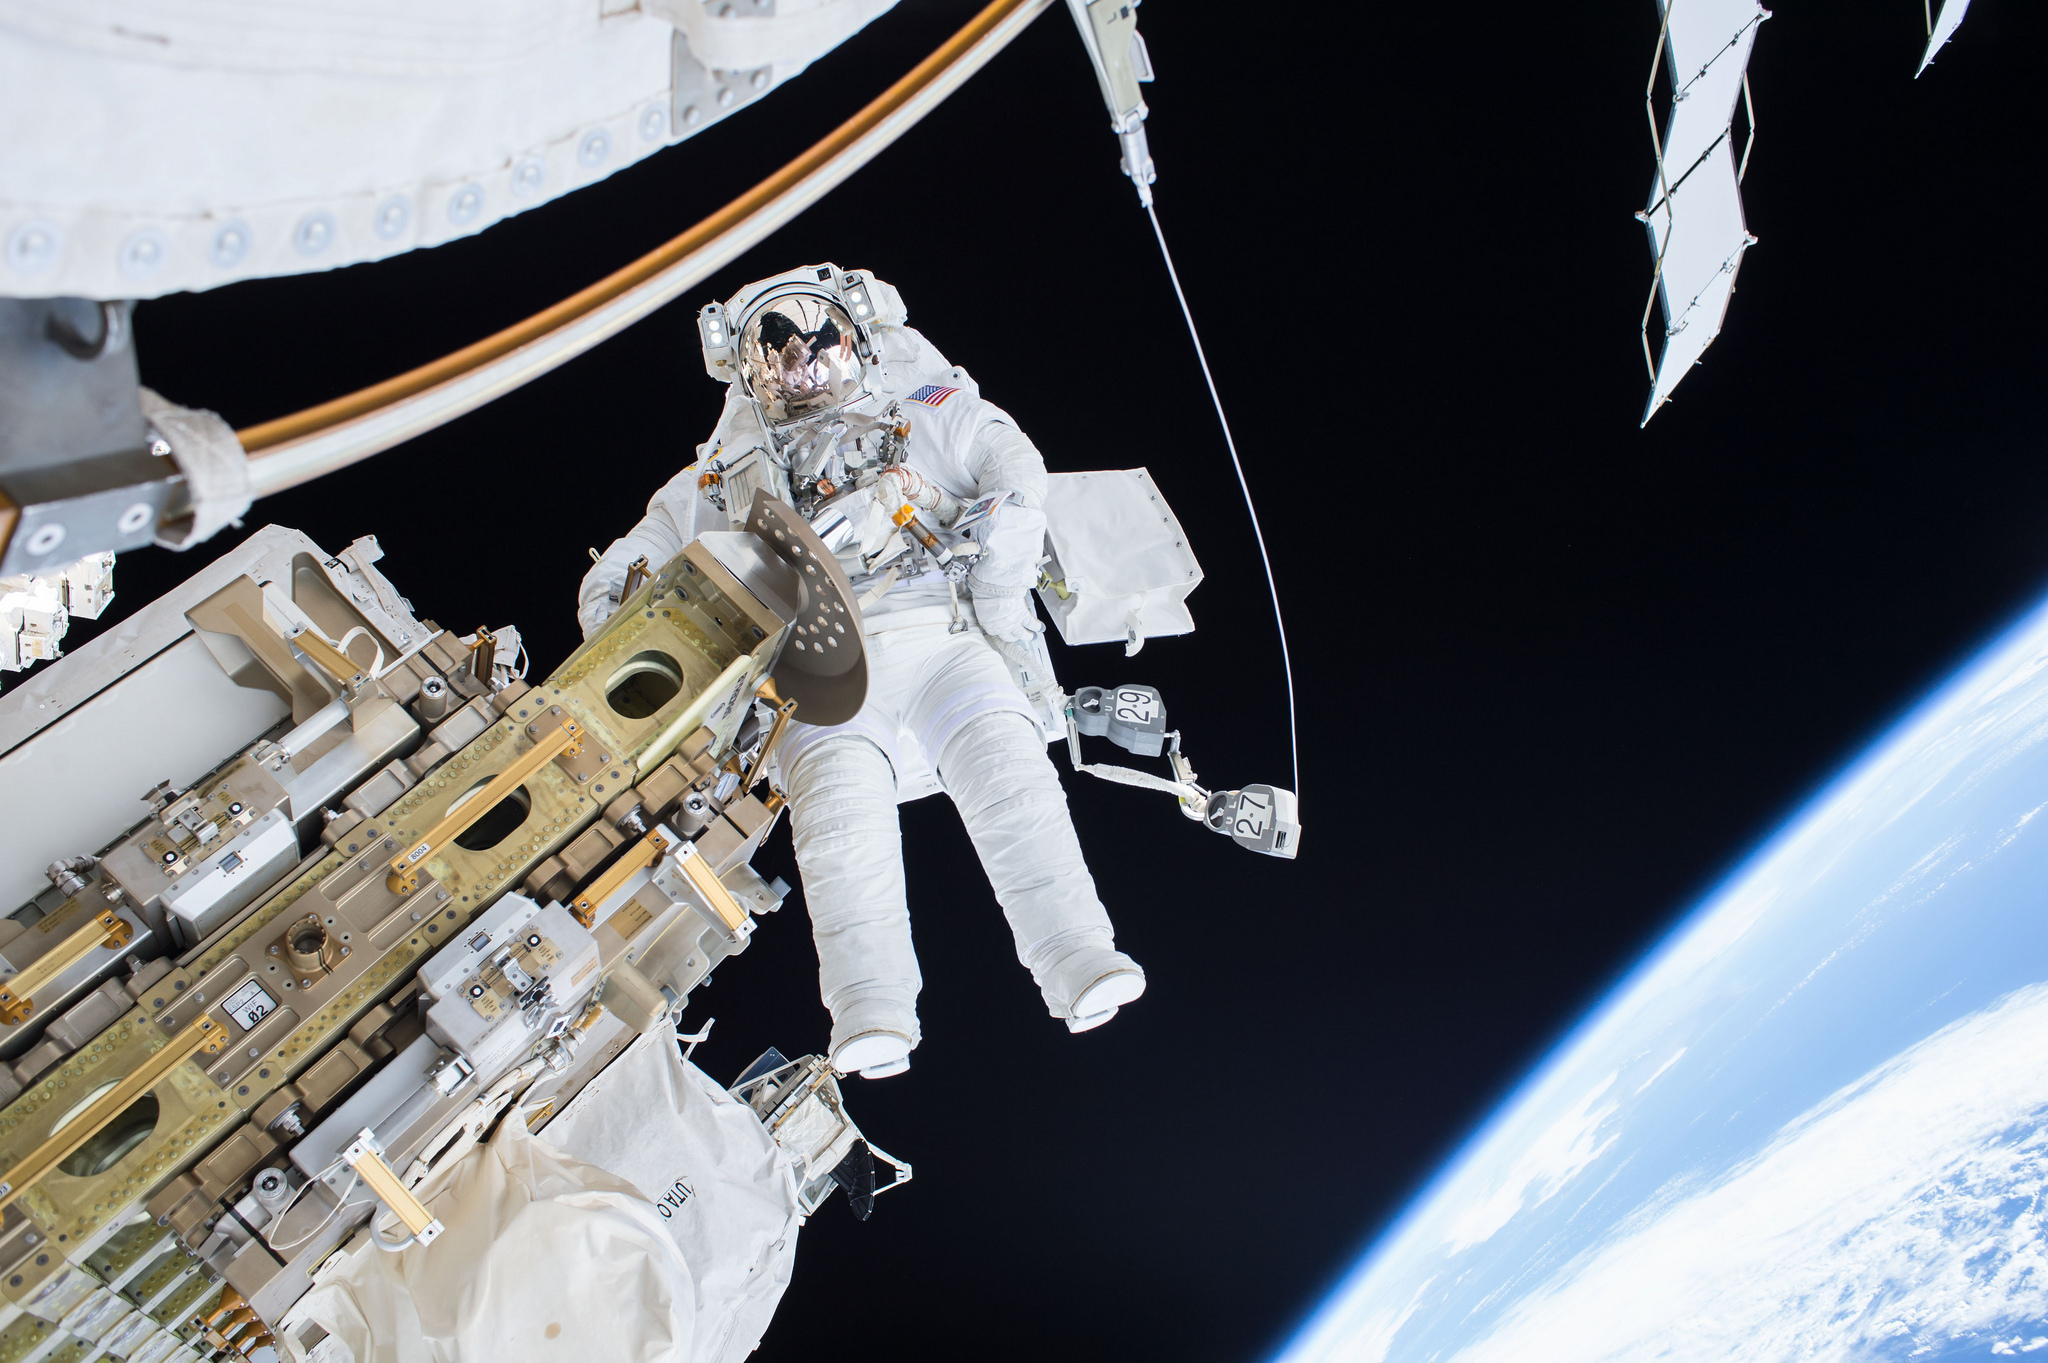 NASA astronaut Tim Kopra